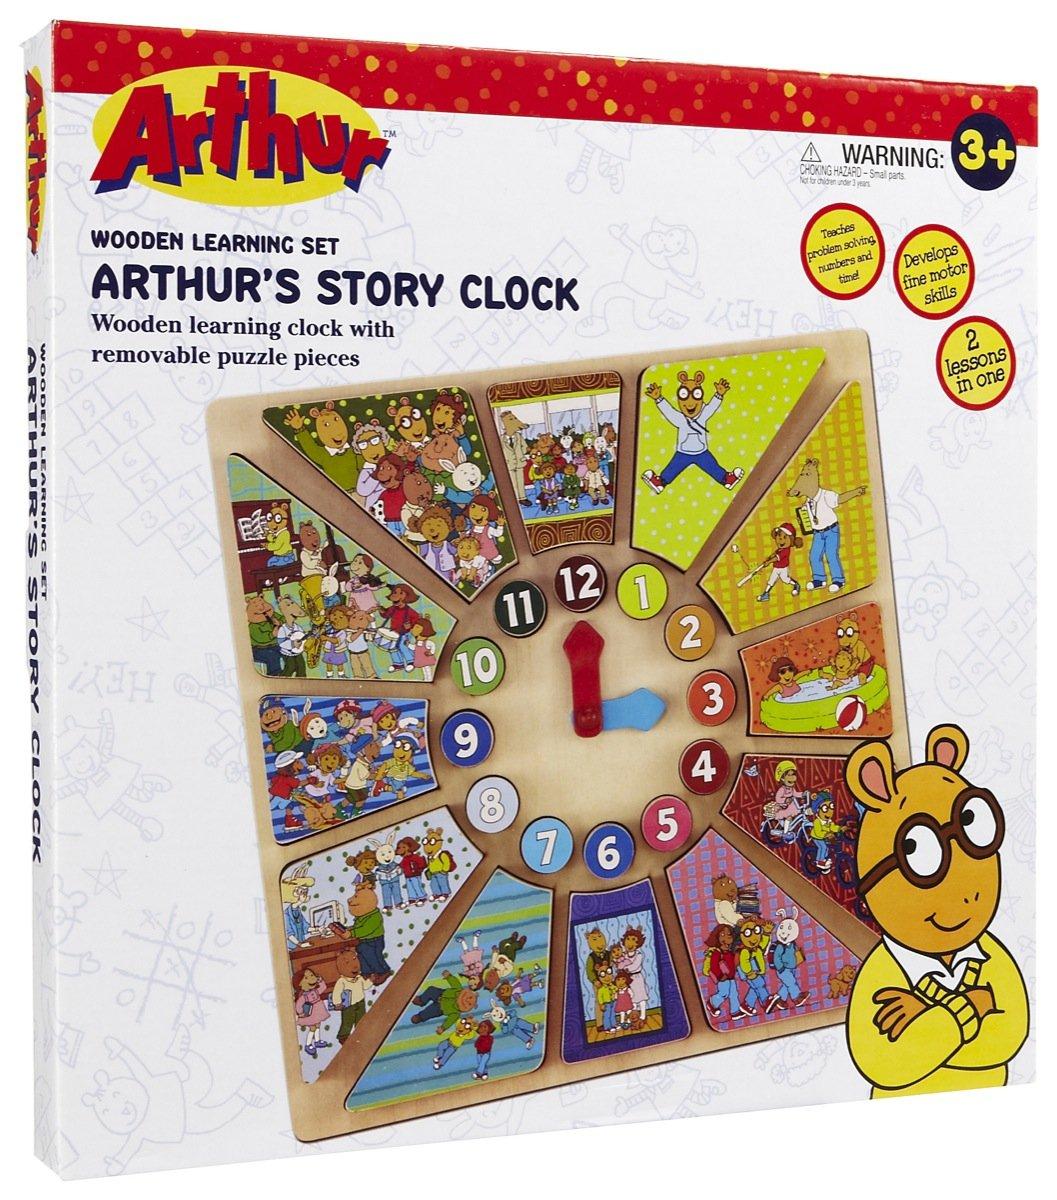 Arthur's Story Clock